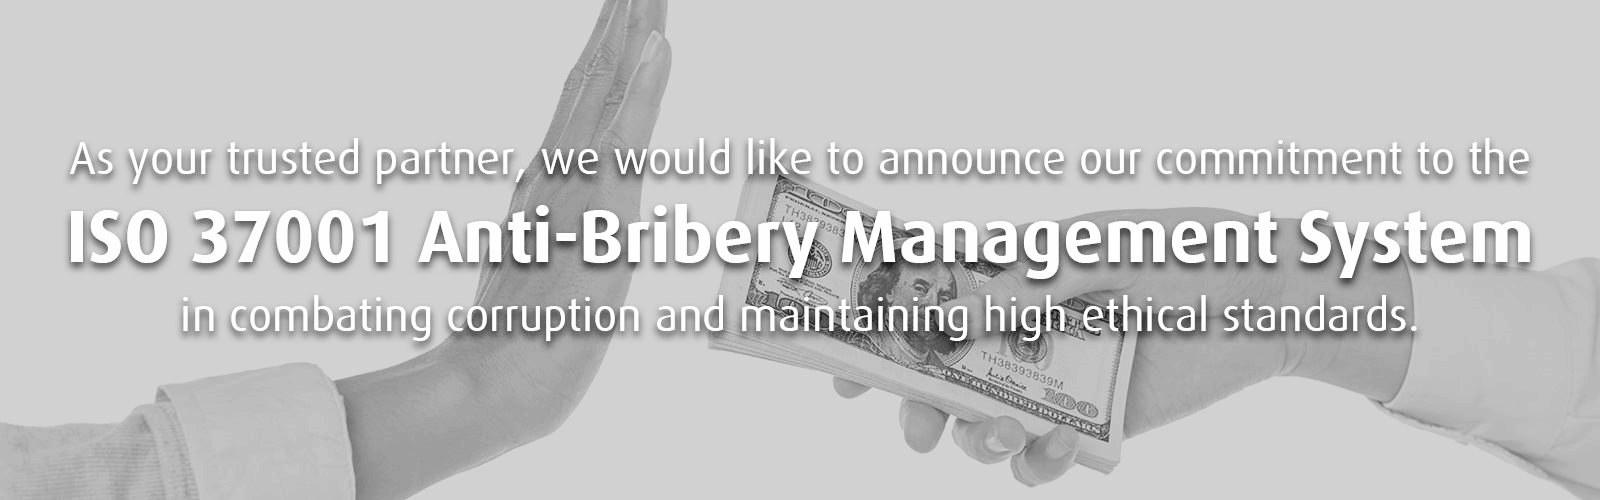 Anti-Bribery-Web-Banner